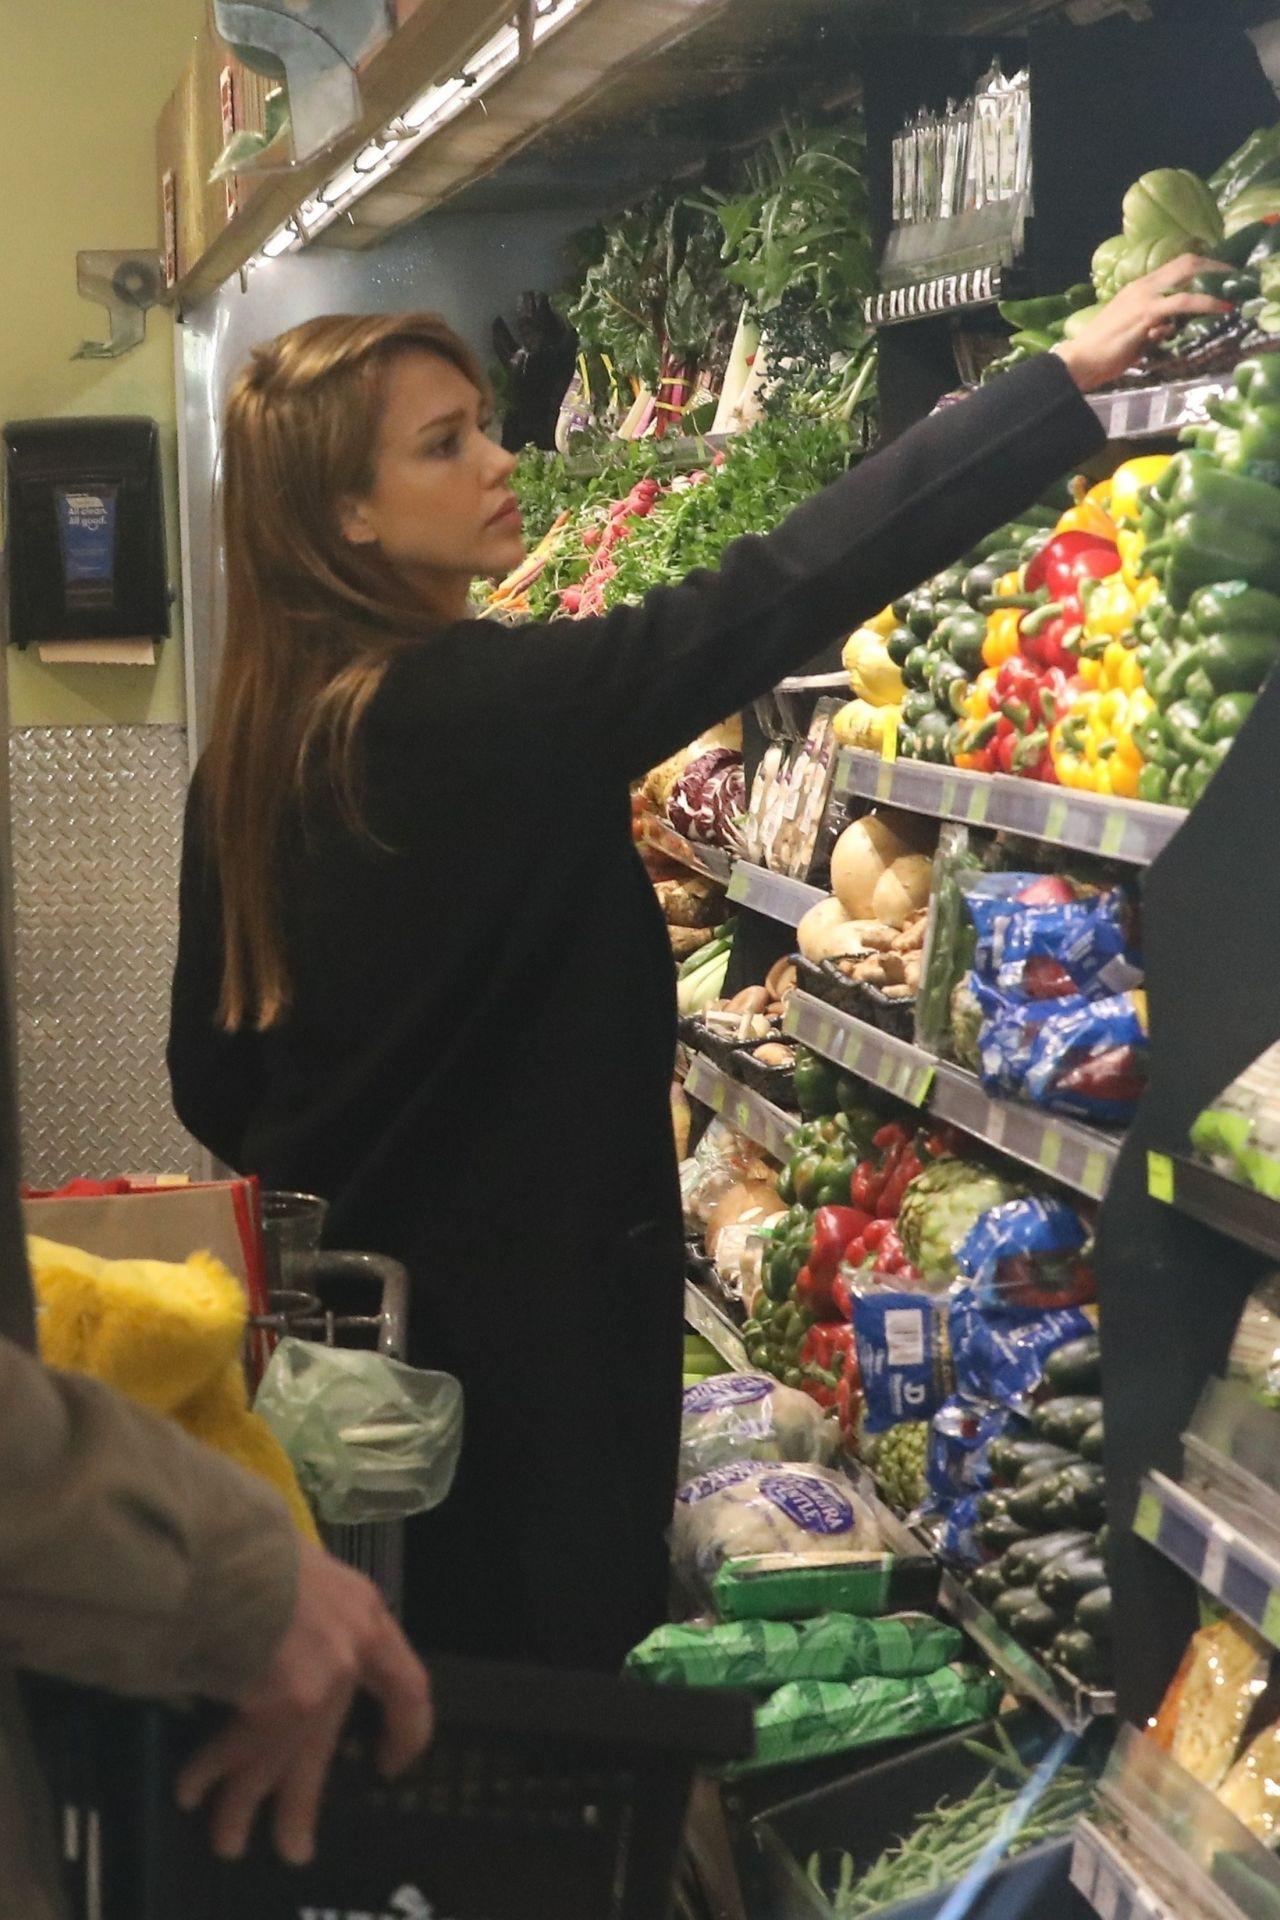 https://celebmafia.com/wp-content/uploads/2019/03/jessica-alba-shopping-at-whole-foods-market-in-beverly-hills-03-09-2019-2.jpg